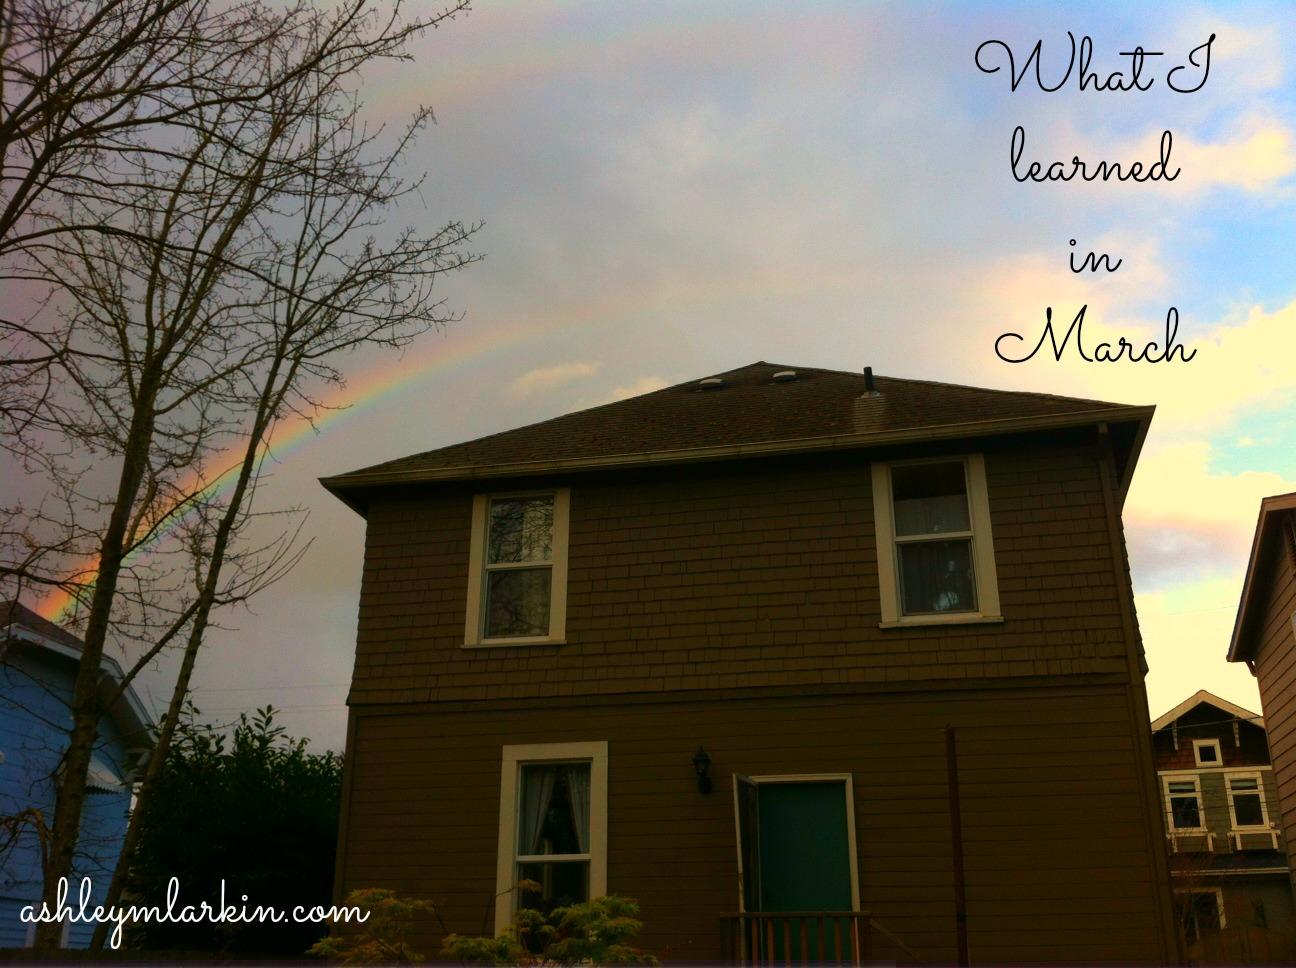 RainbowOverHome